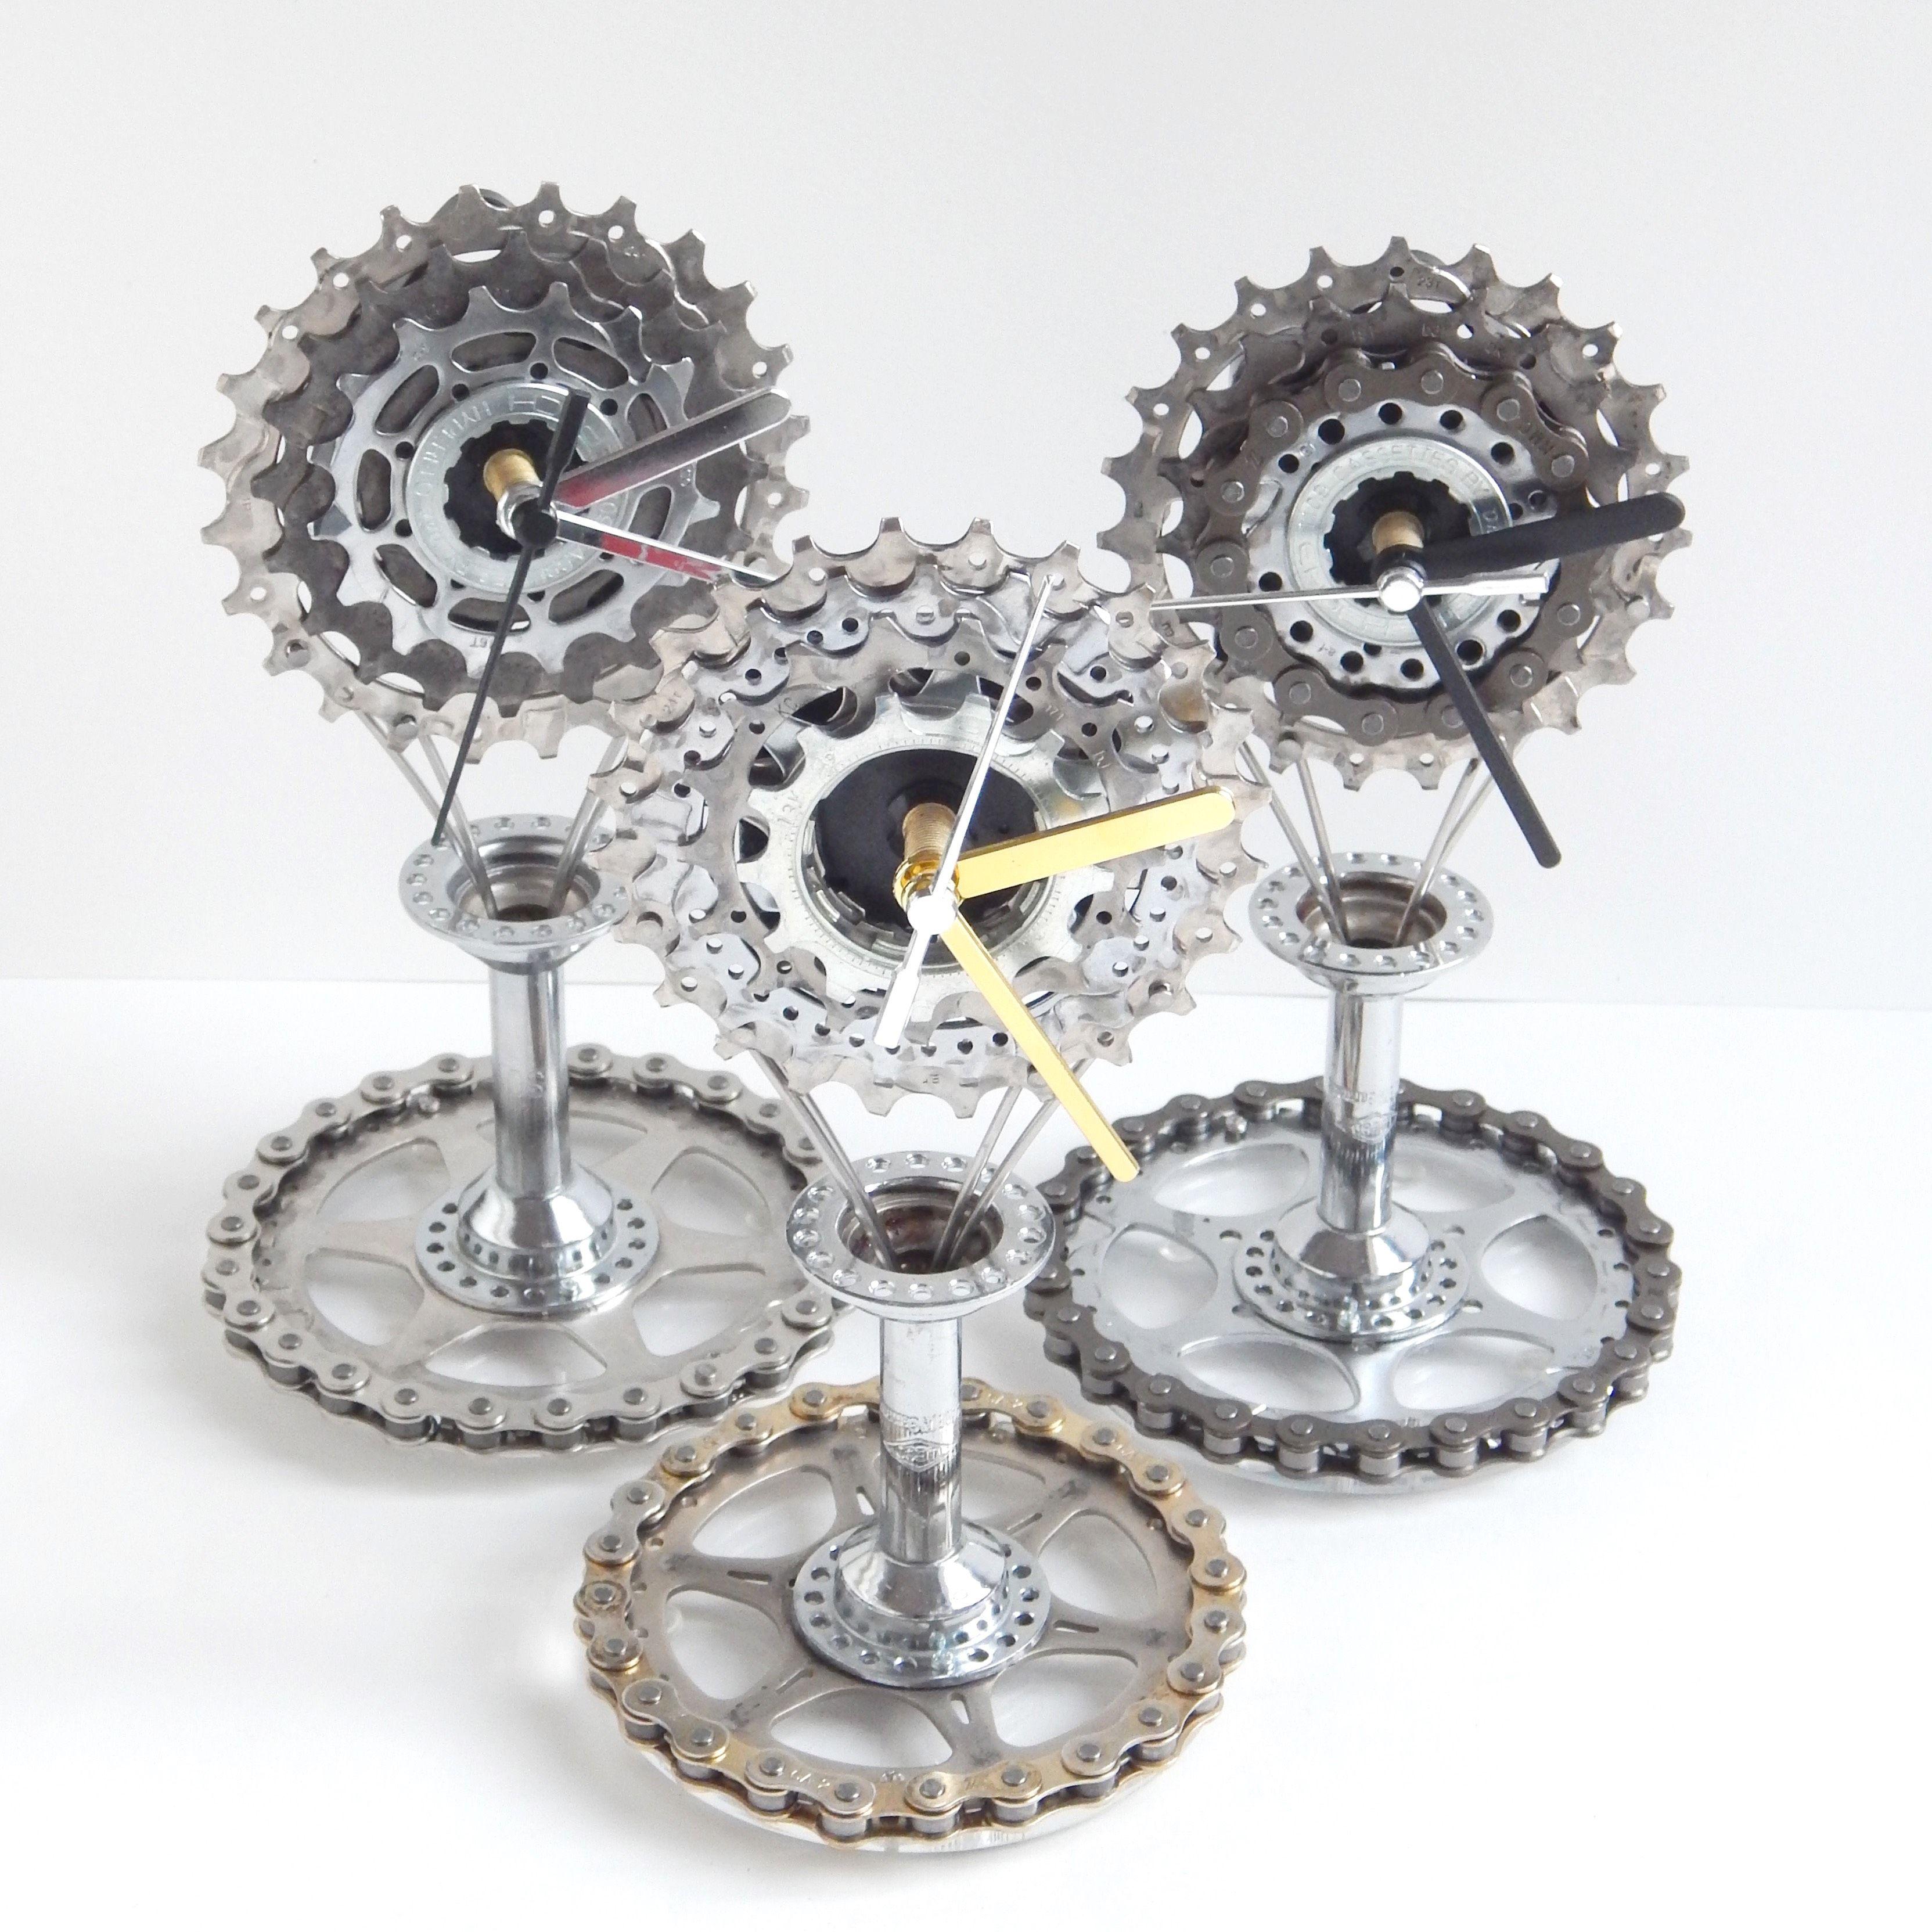 unique design by recycle u0026 bicycle recycled bike cassette u0026 hub mantel desk clock